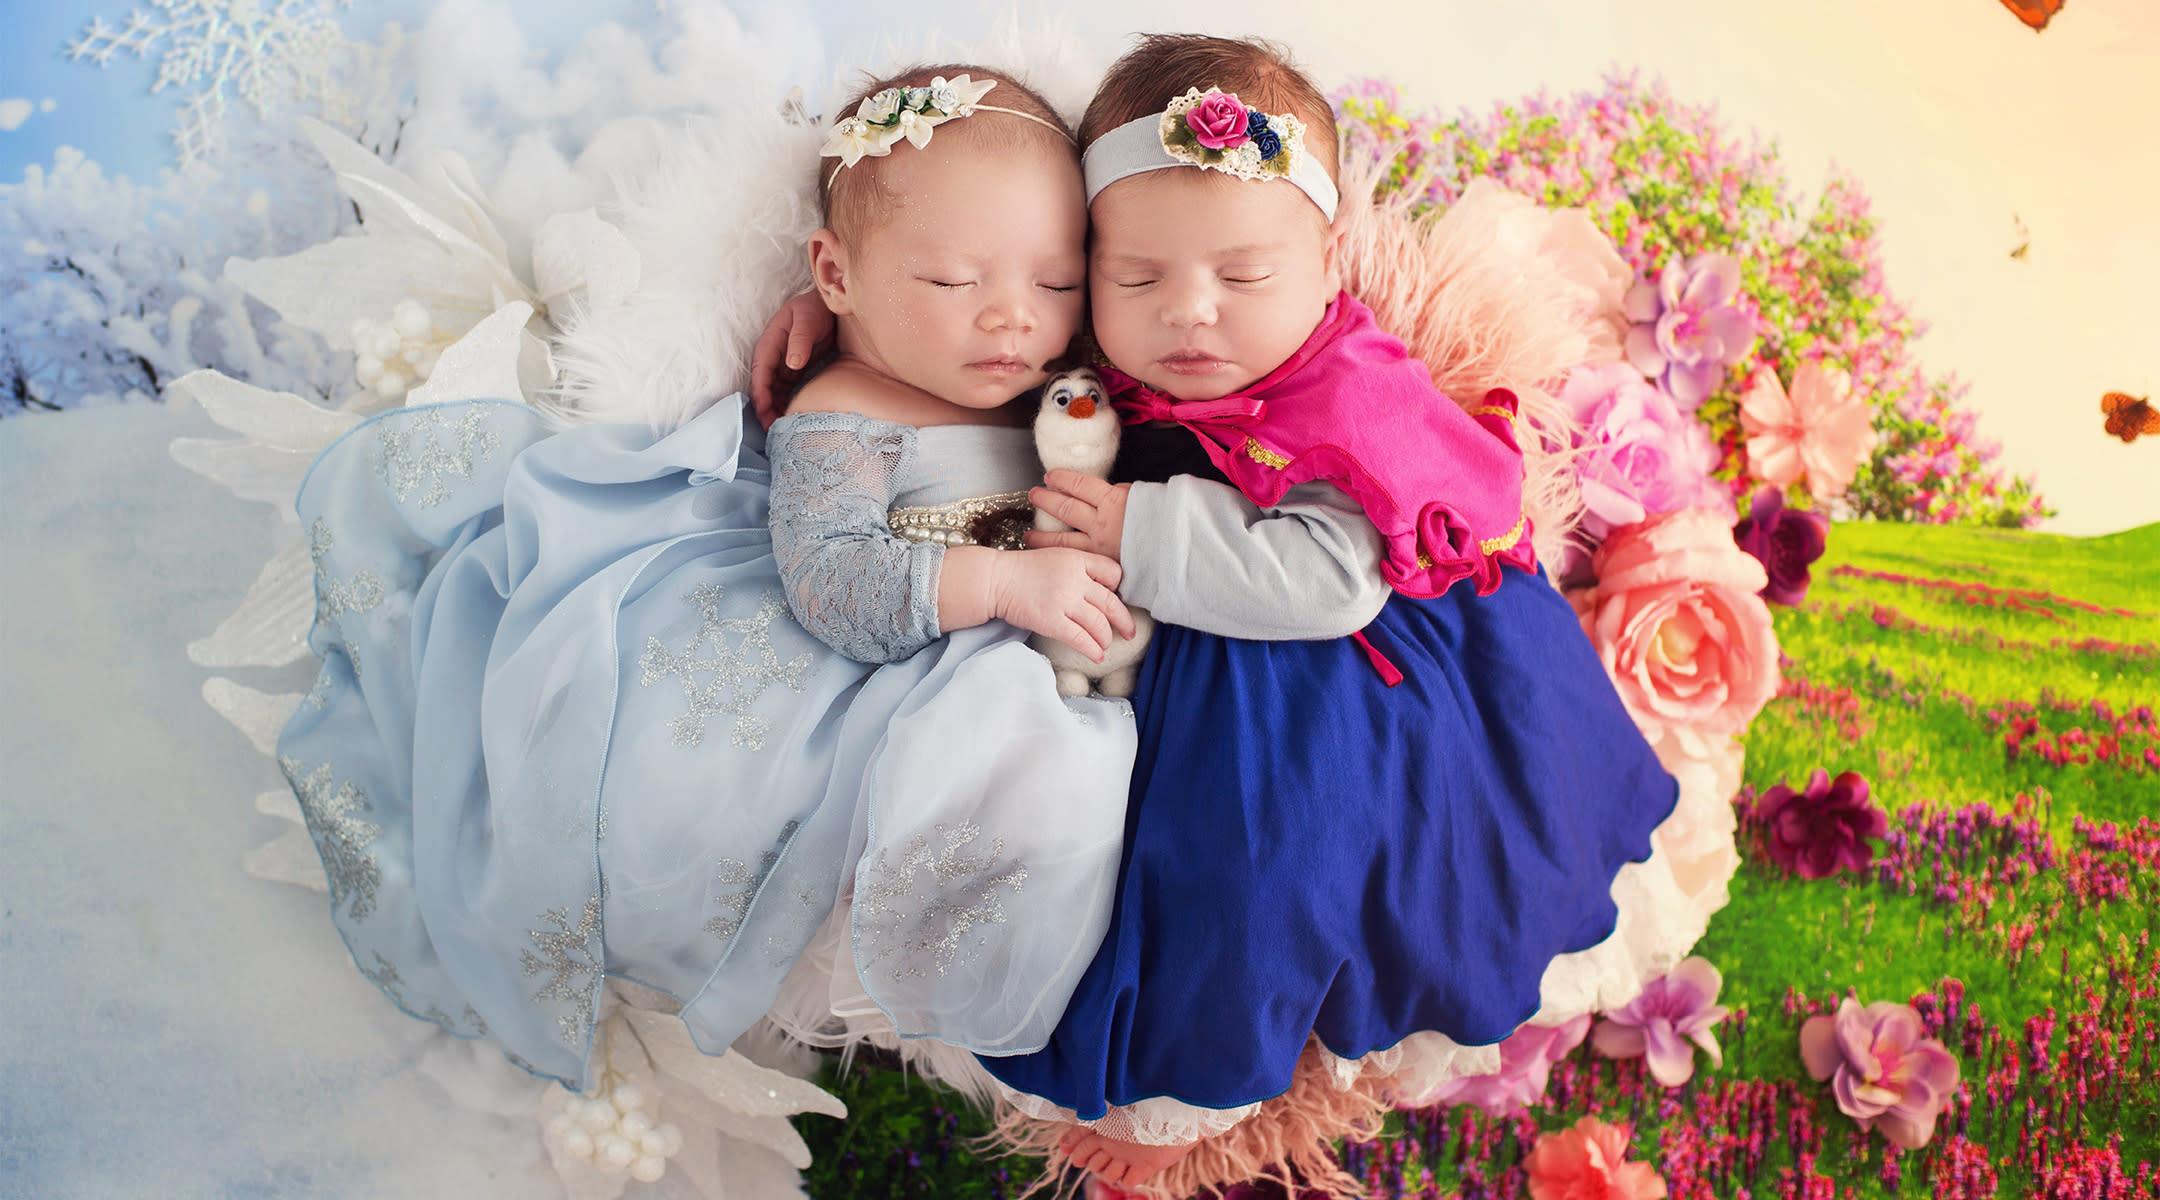 Sleeping newborns dressed as frozen characters in sweet photo shoot